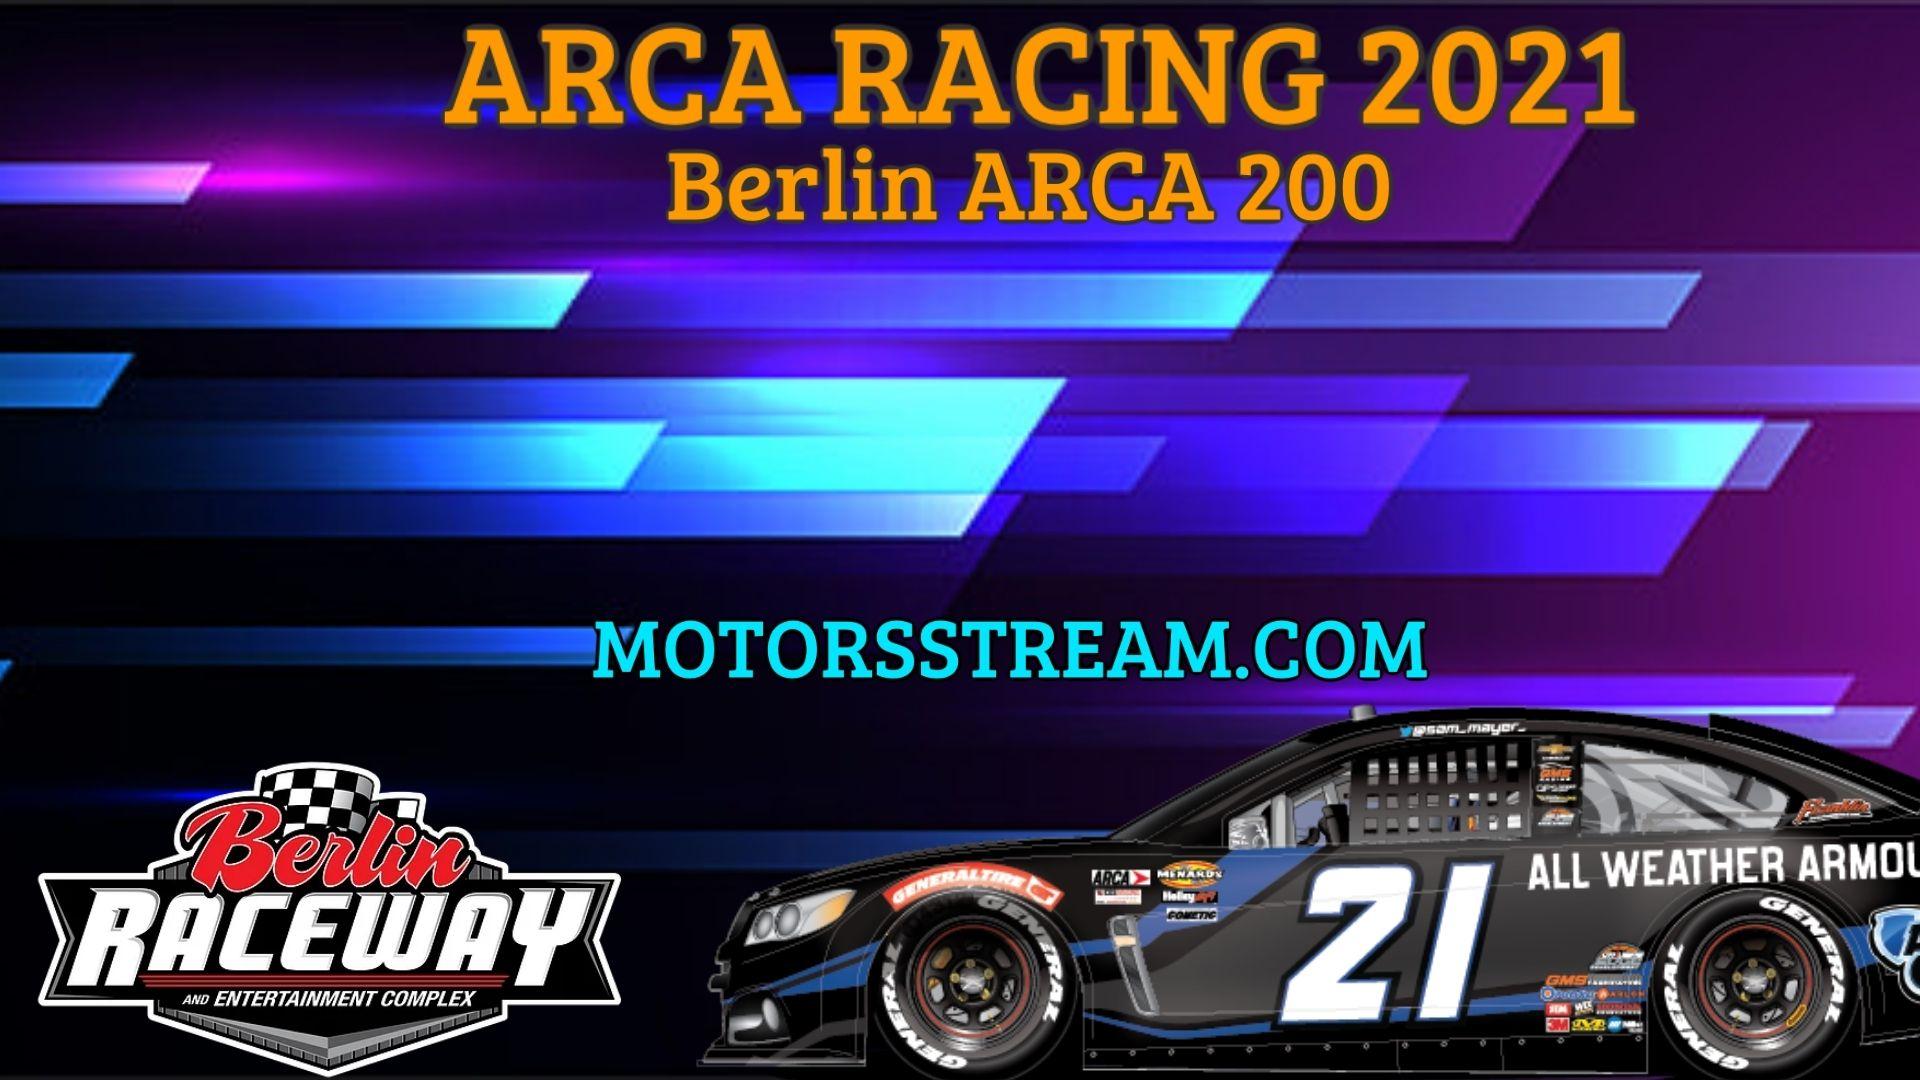 Berlin ARCA 200 Live Stream 2021 Arca Racing